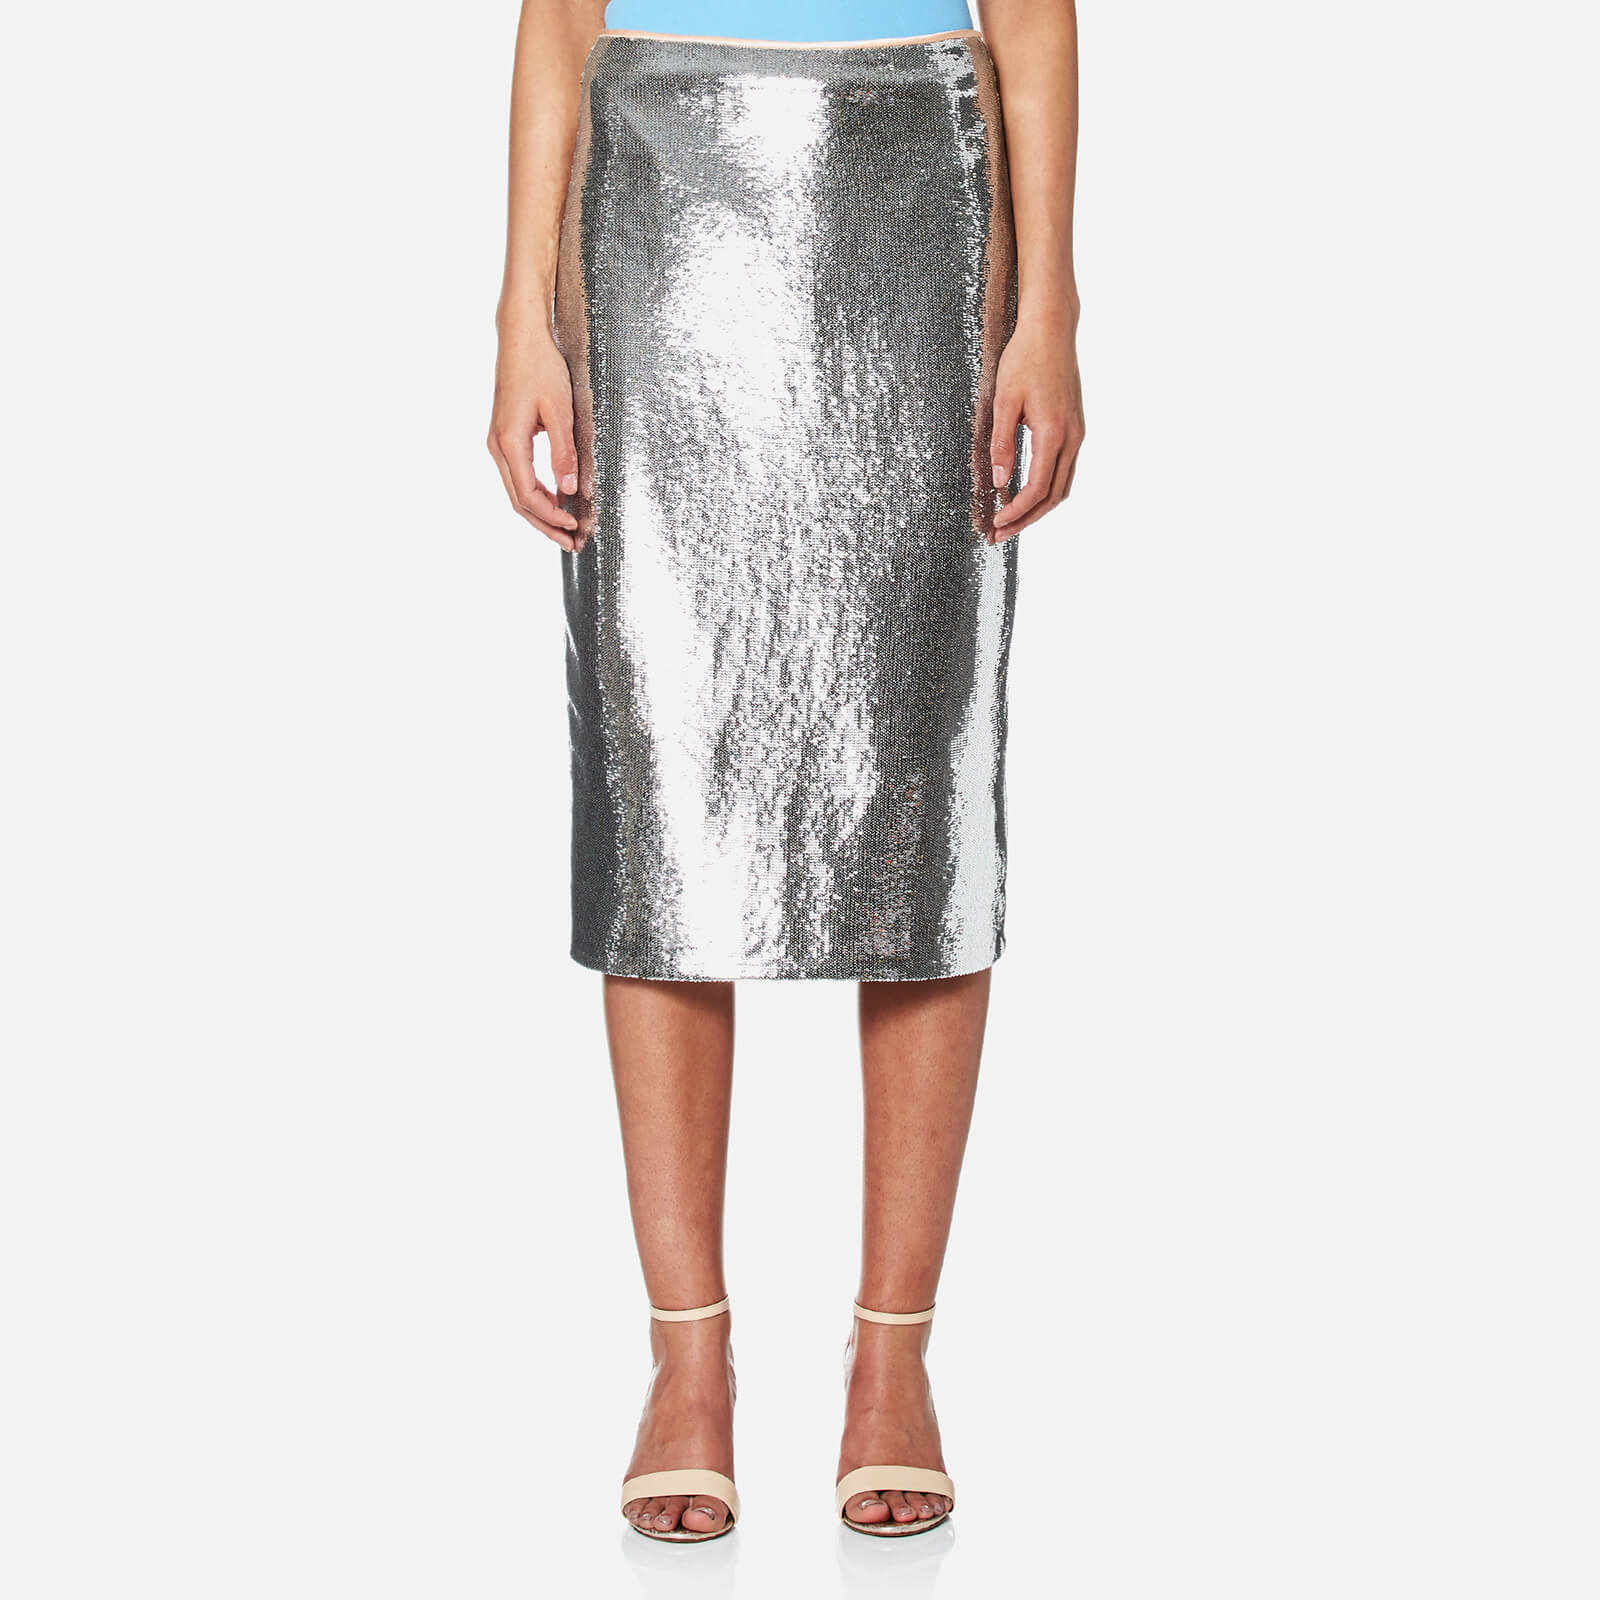 0b076ac32903 Diane von Furstenberg Women's Midi Sequin Pencil Skirt - Silver/Nectar -  Free UK Delivery over £50